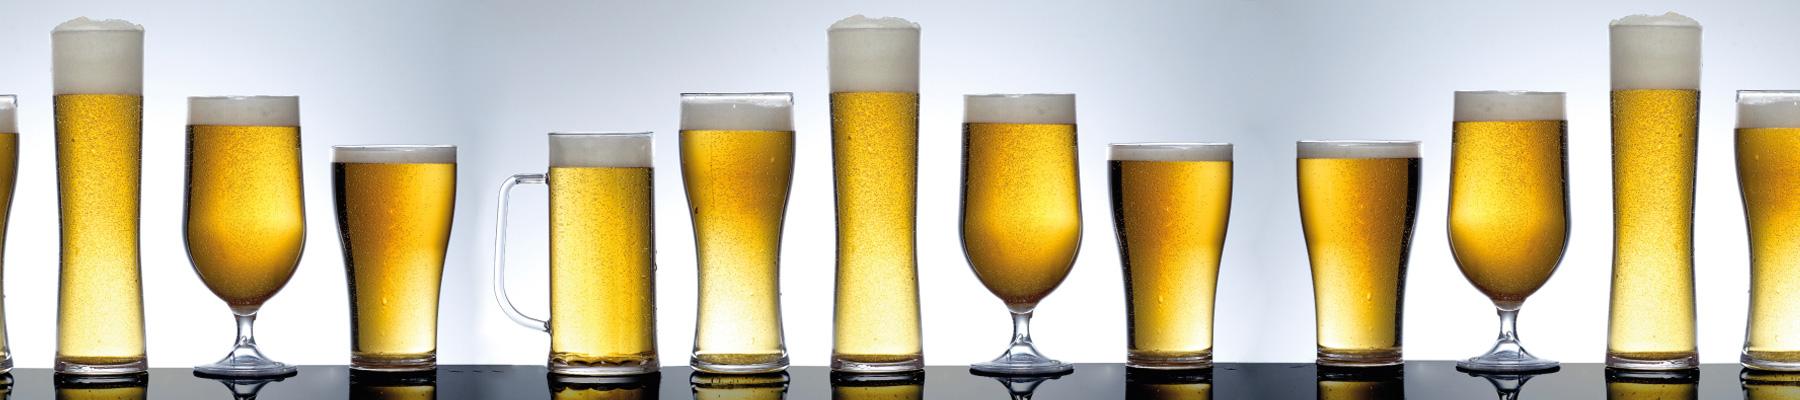 Plastic beer glasses hampshire